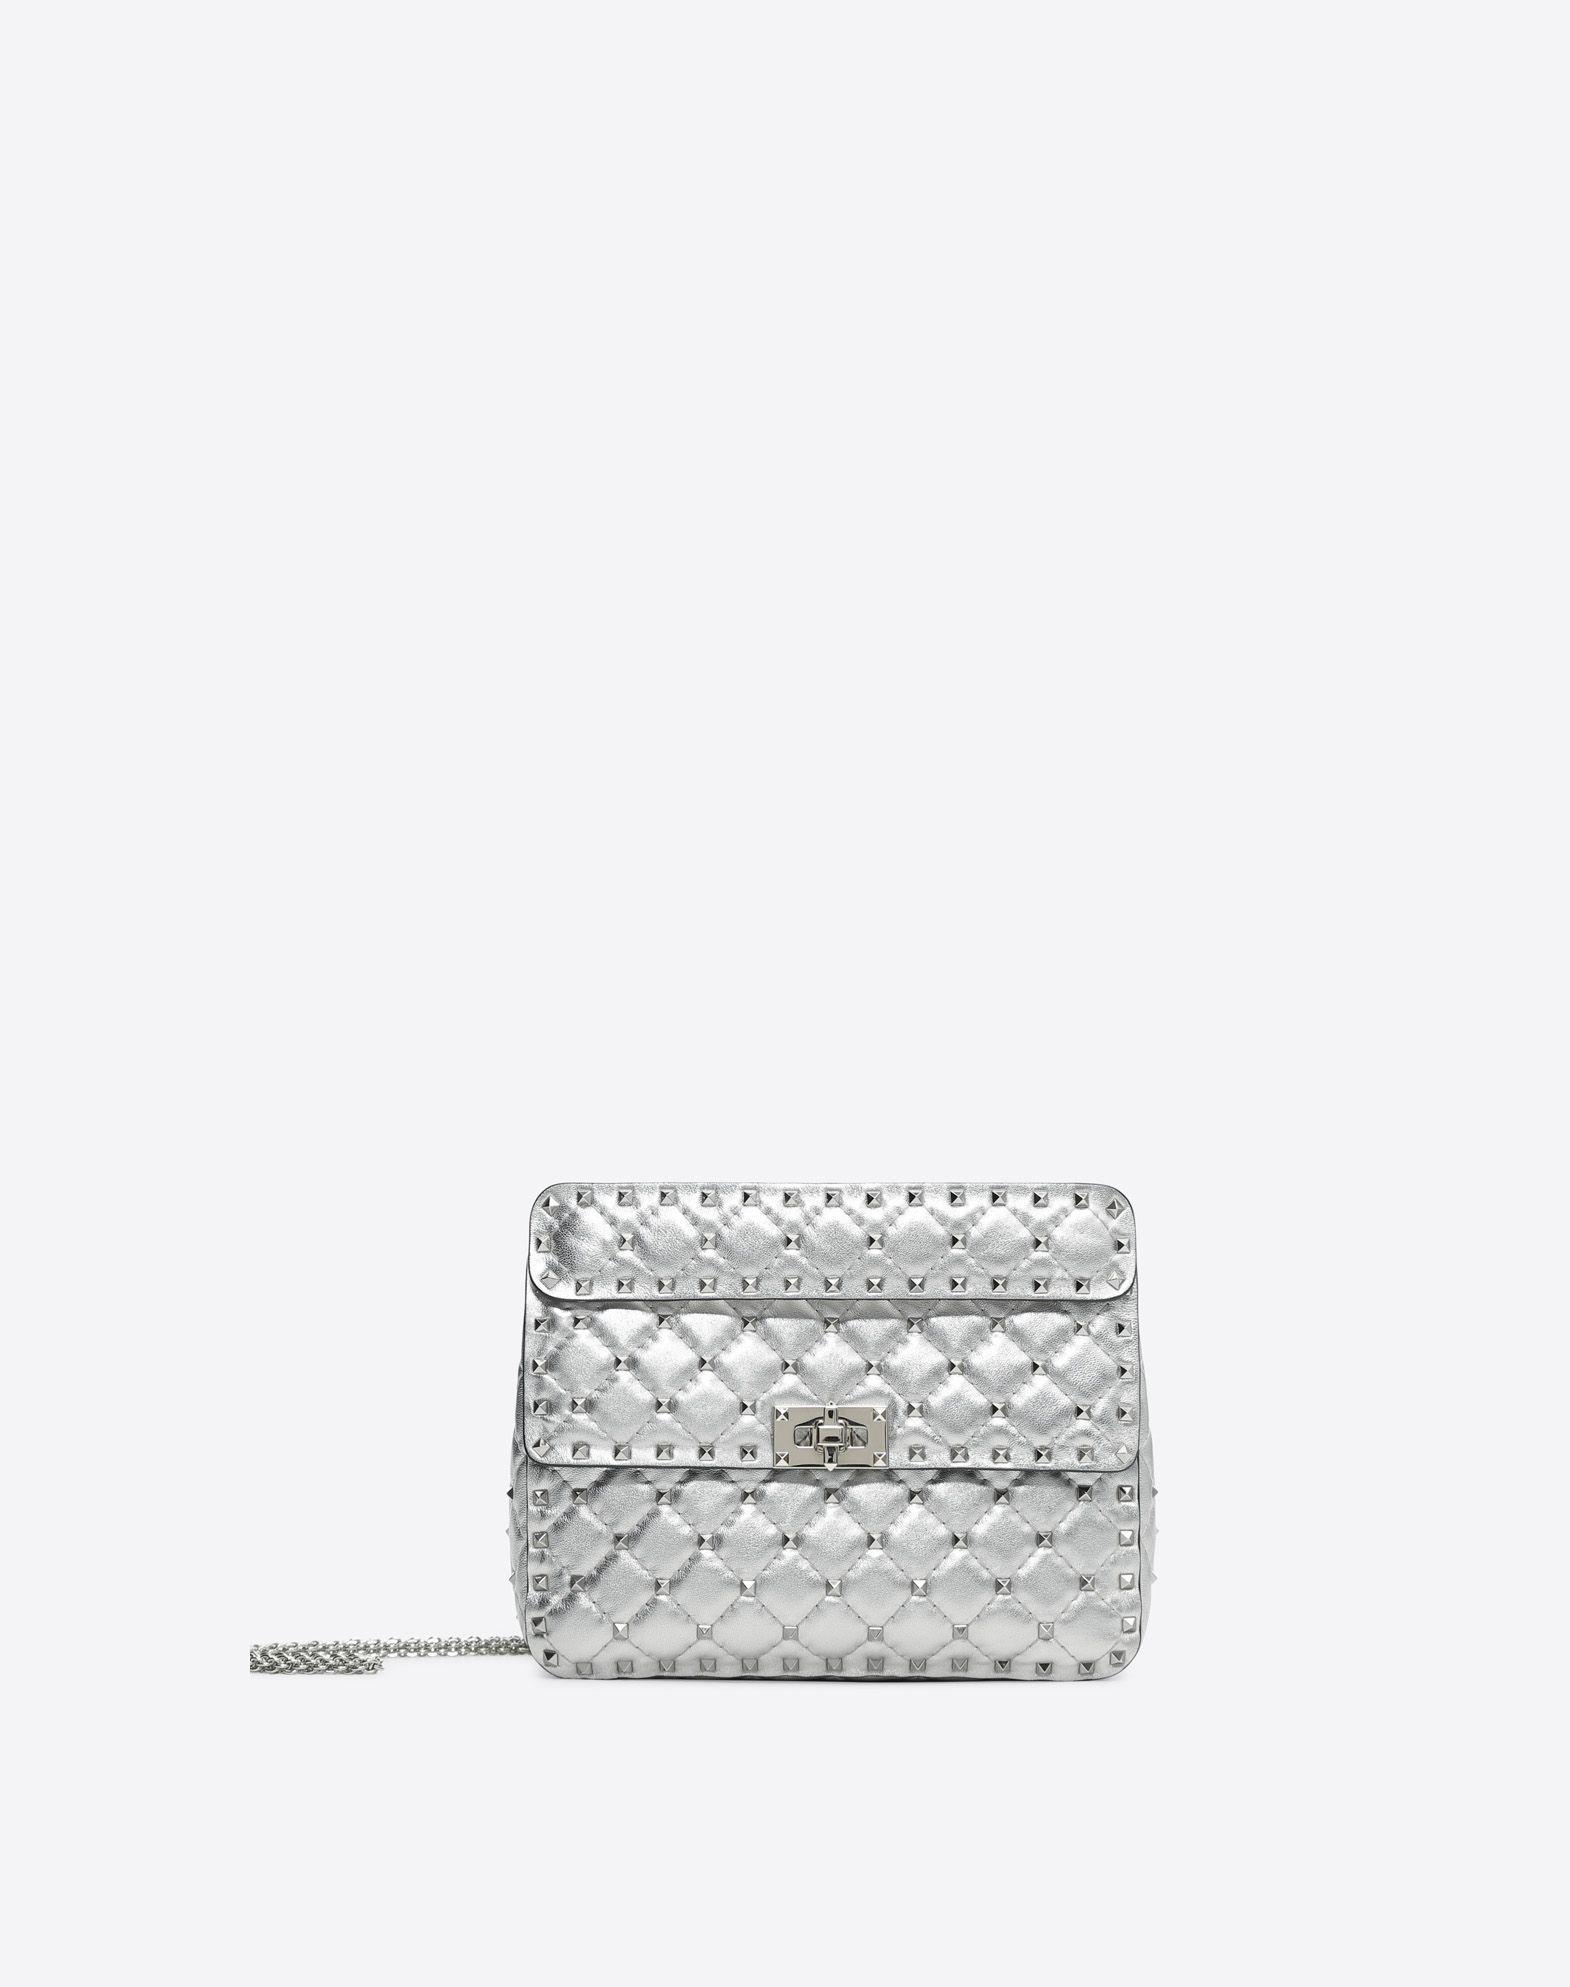 2efe8034acb VALENTINO ROCKSTUD SPIKE MEDIUM CHAIN BAG.  valentino  bags  shoulder bags   hand bags  lining  leather  metallic